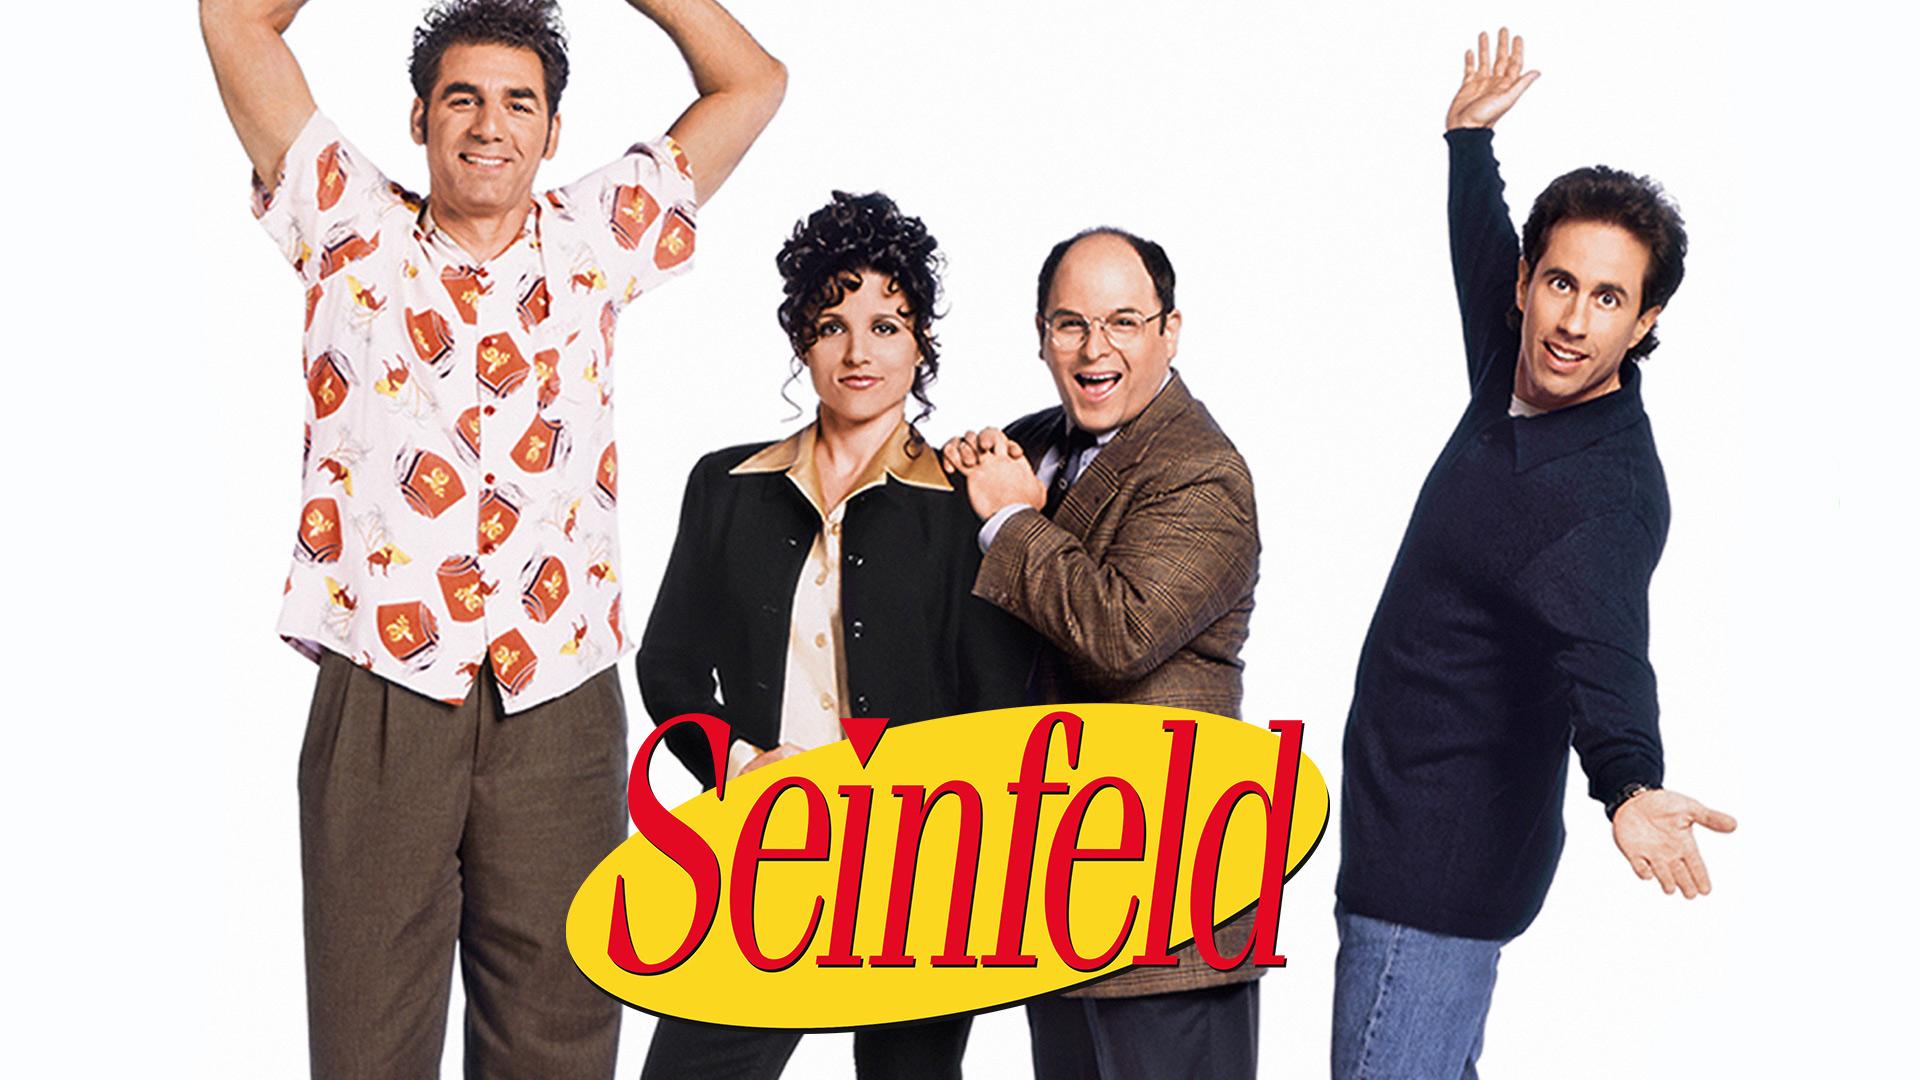 Seinfeld Seasons 1 & 2